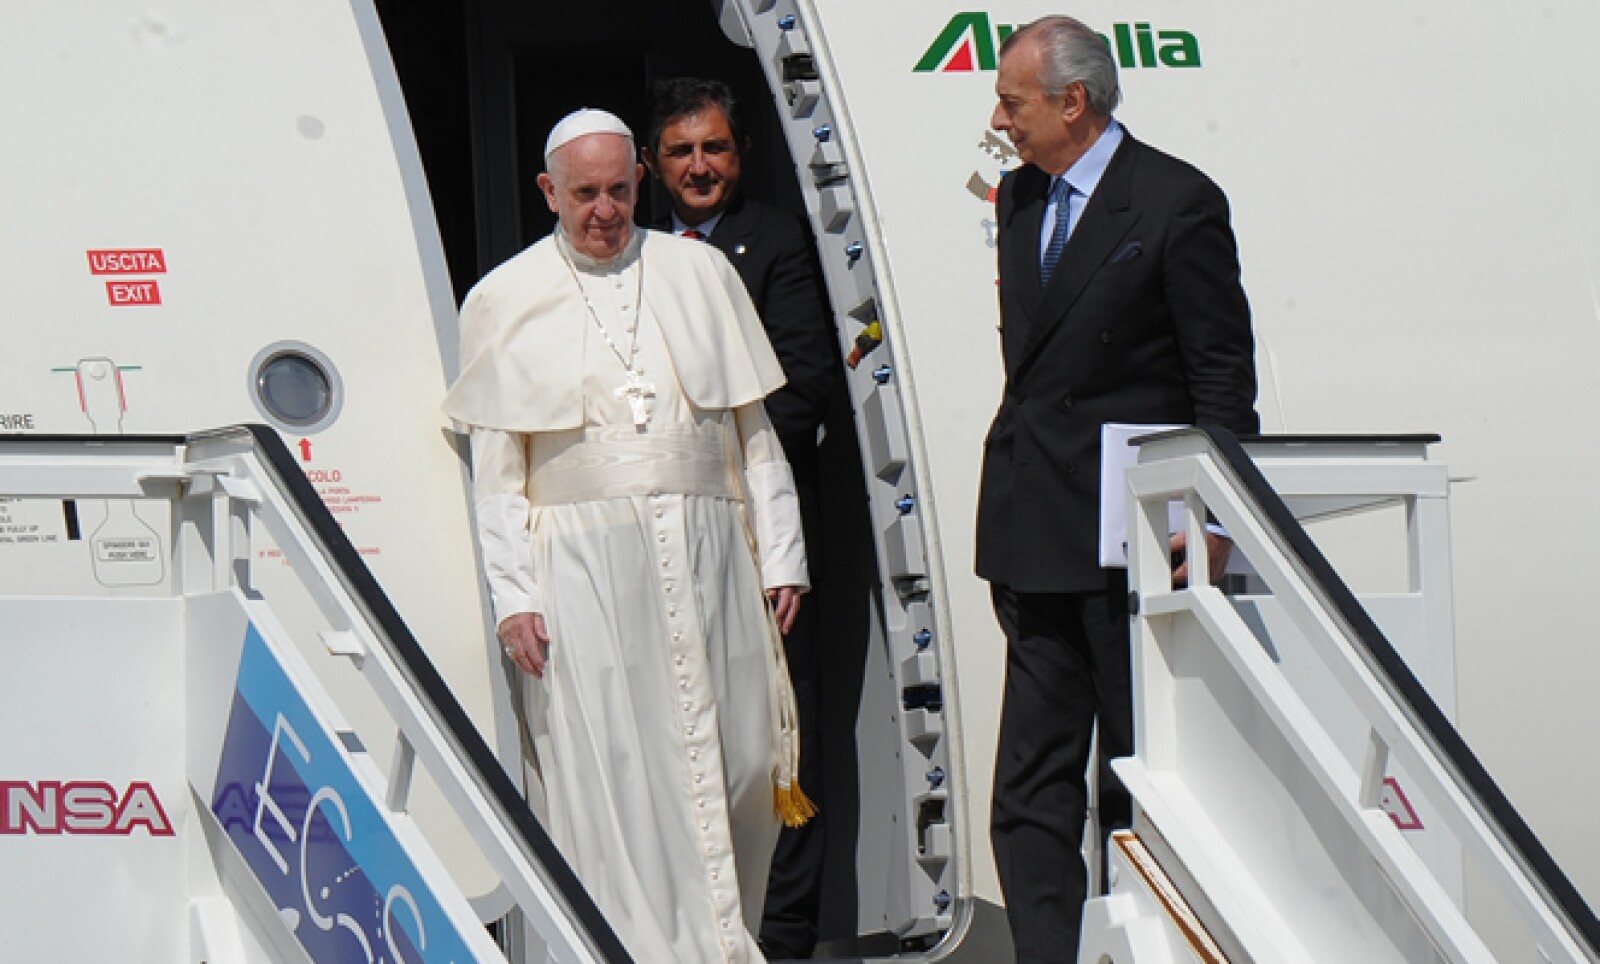 El papa hizo una visita a la capital cubana en menos de cinco meses, antes de llegar a México.